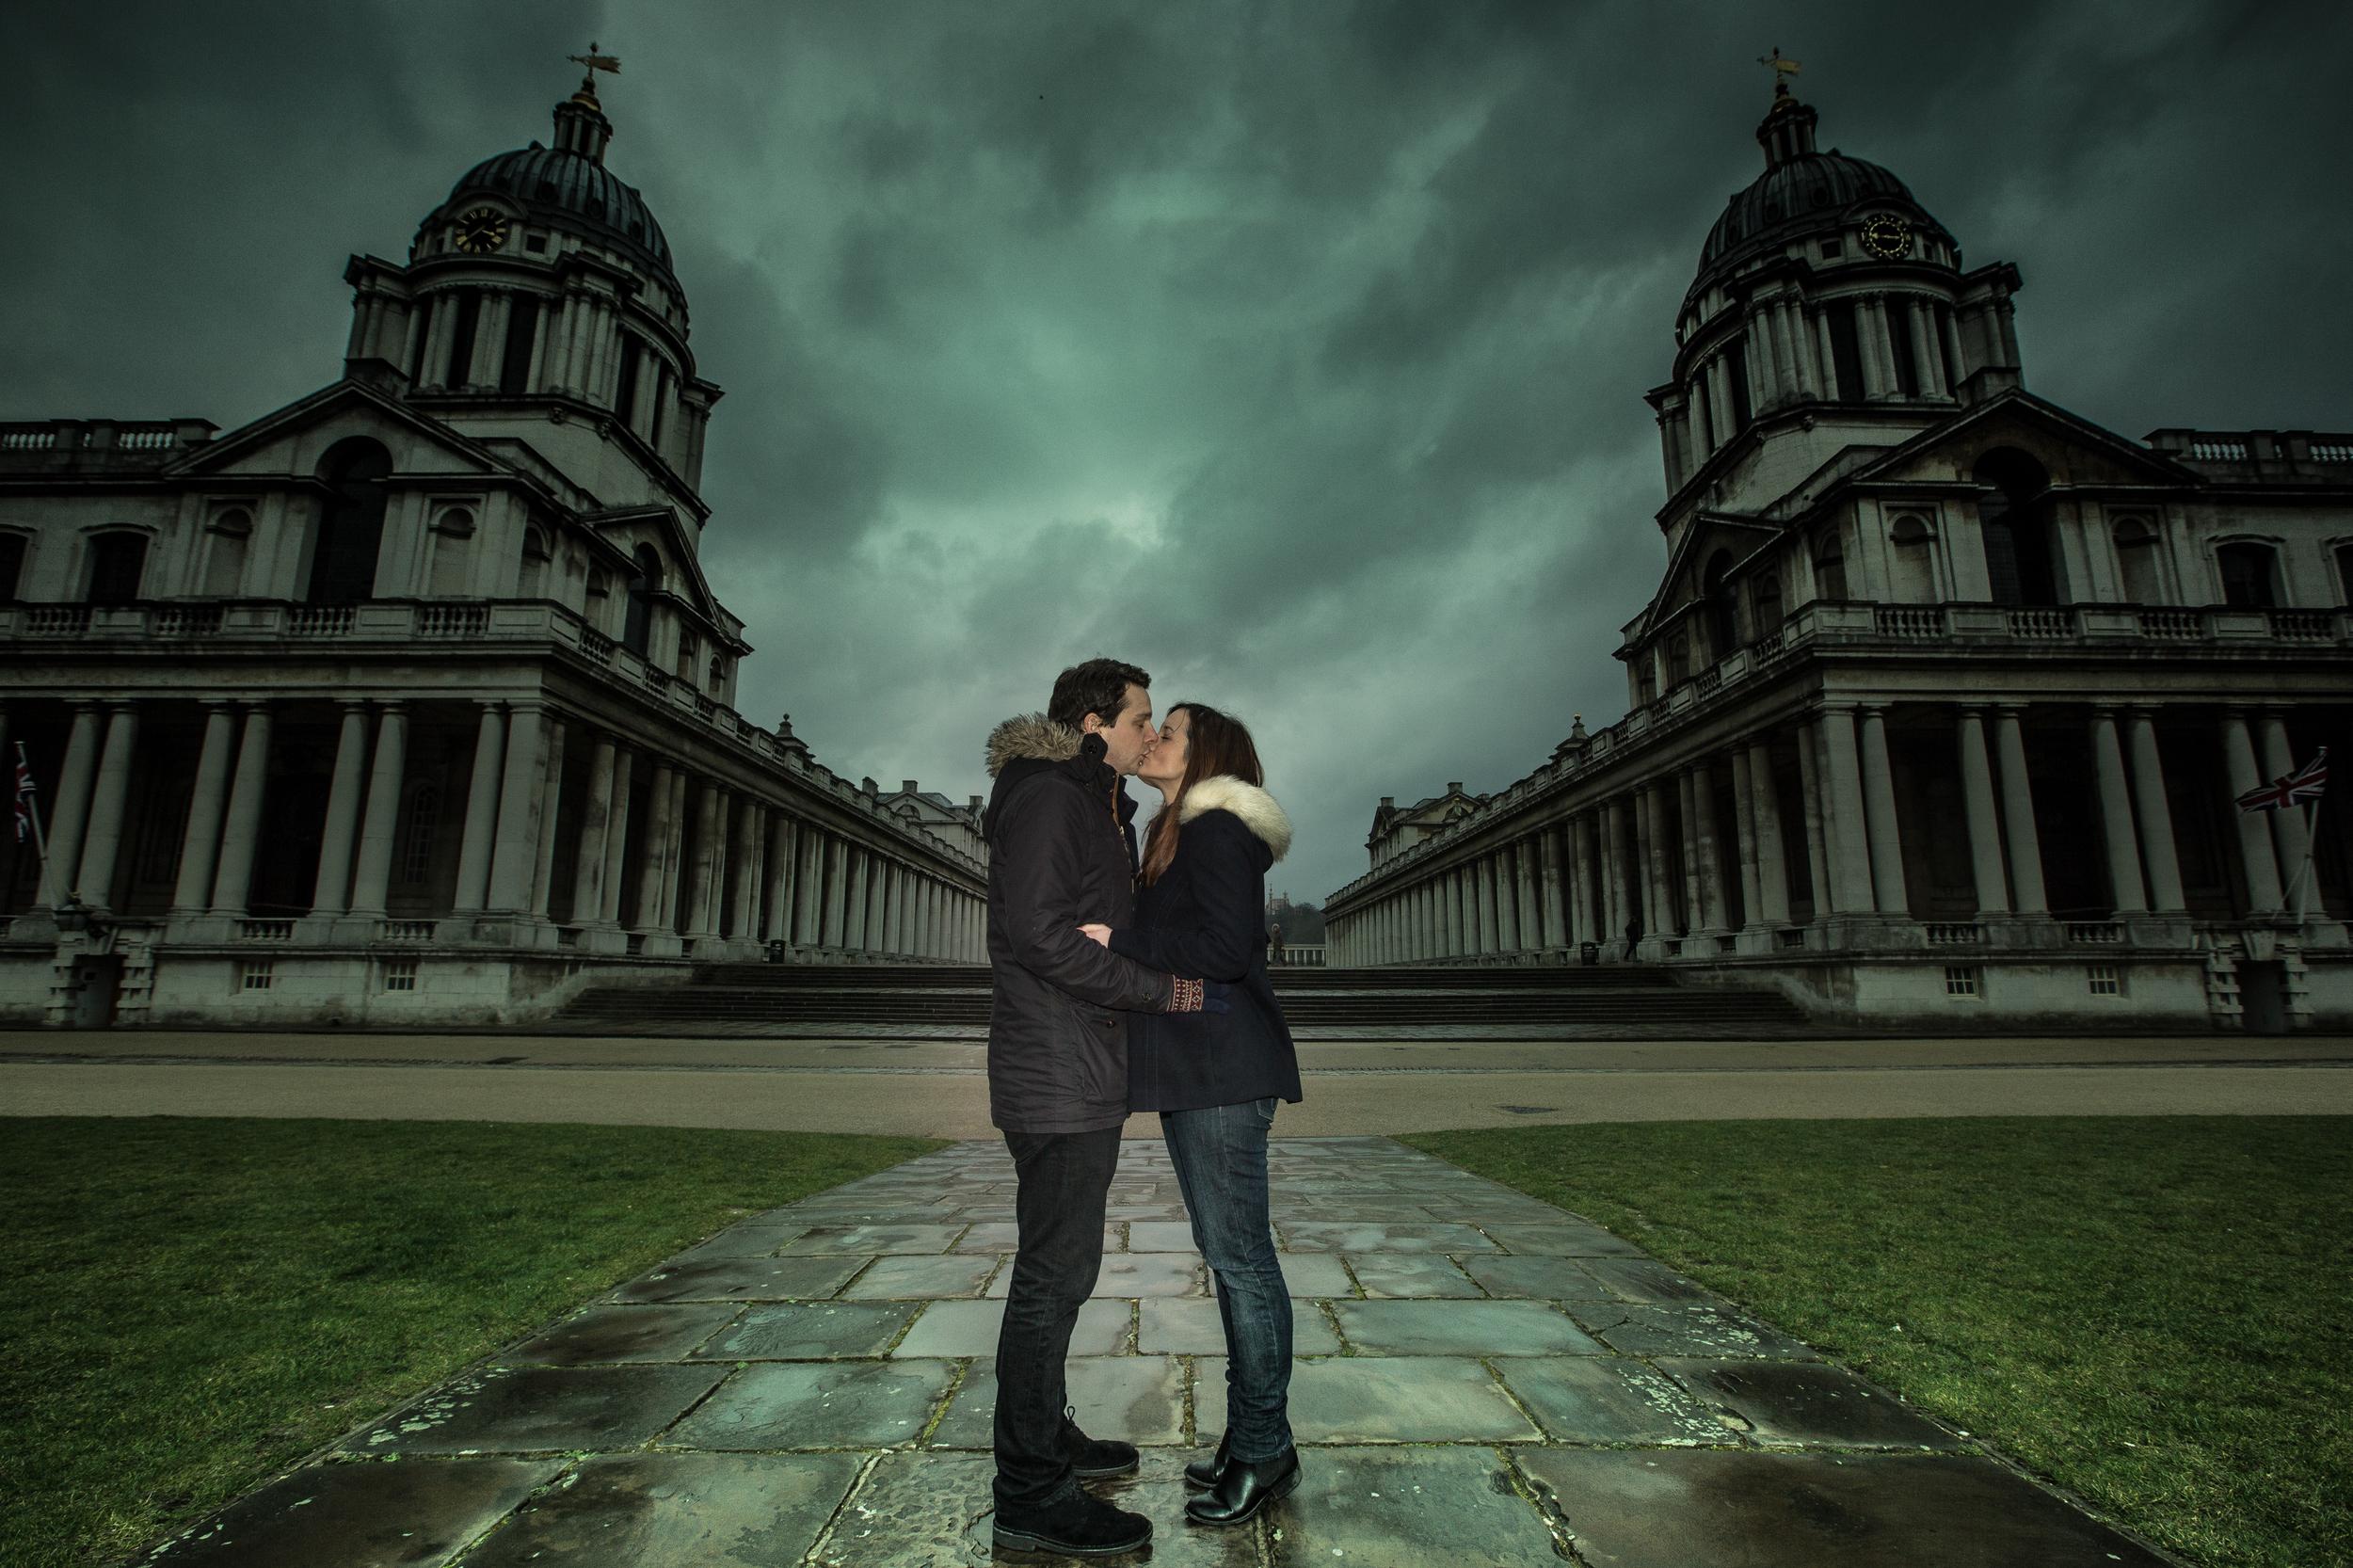 greenwich-royal-naval-academy-engagement-6-london-uk-destination-wedding-photography-Adam-Rowley